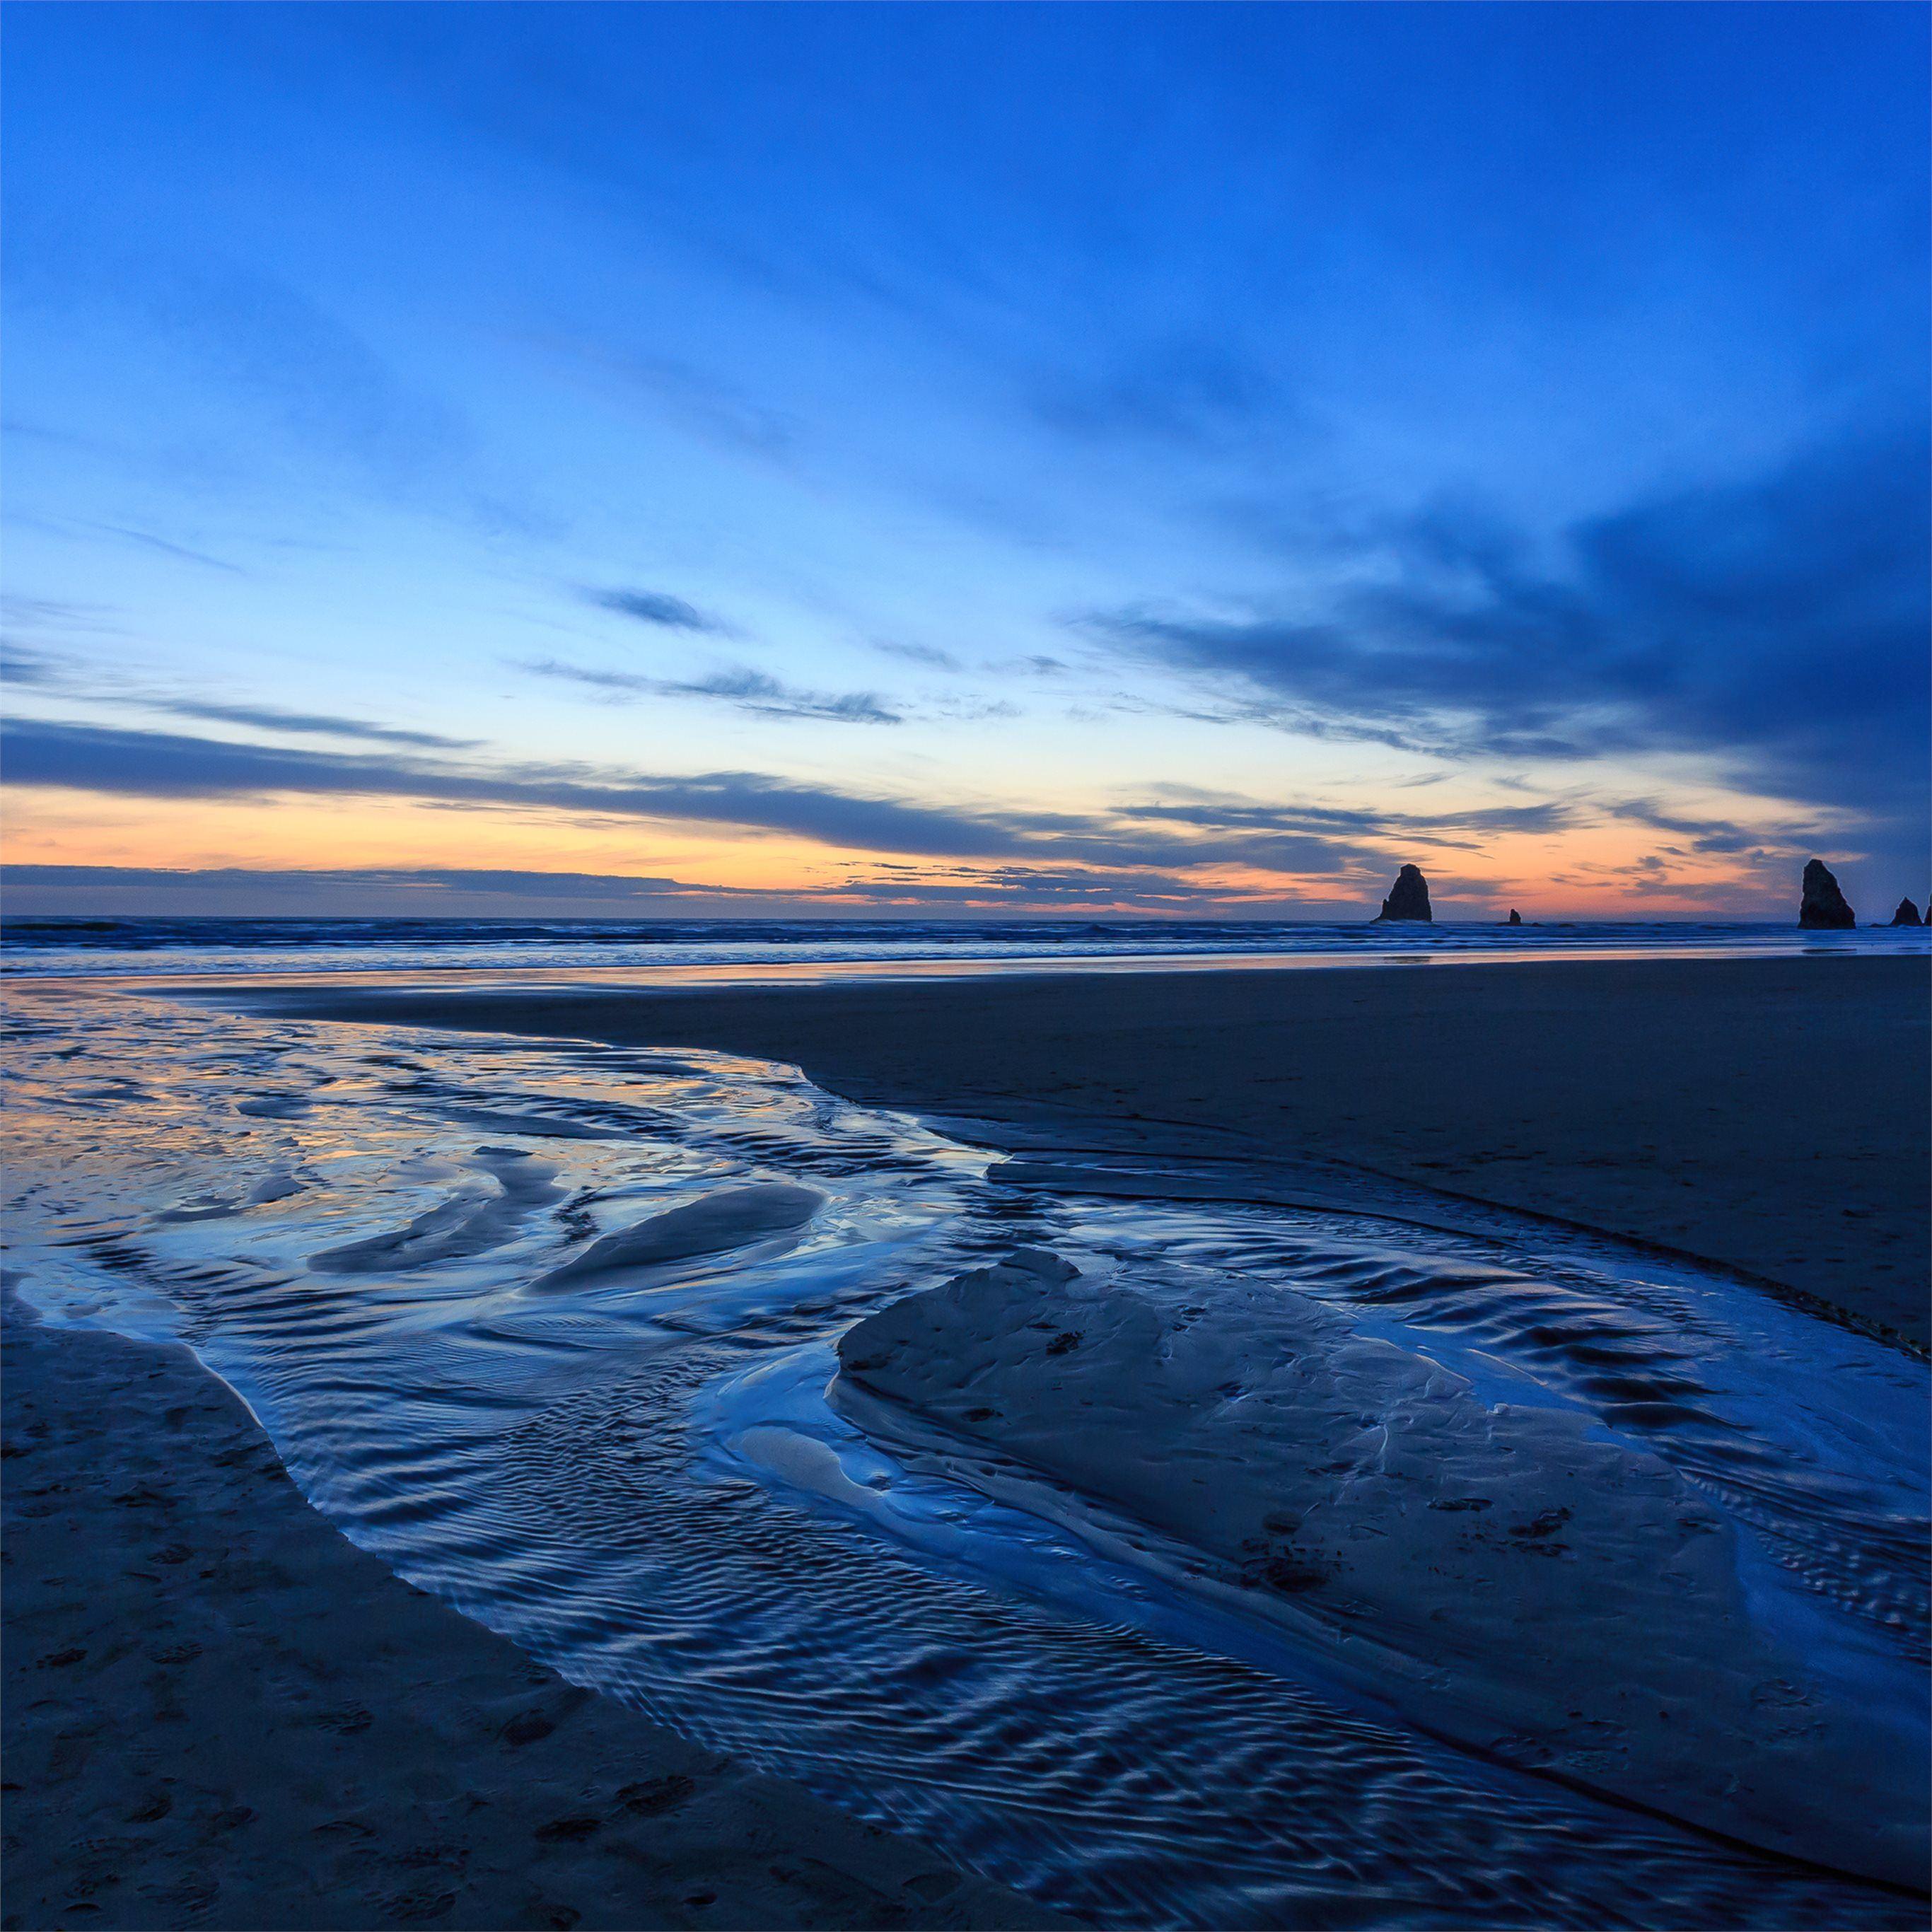 Ocean Sea Sky 4k IPad Pro Wallpapers Free Download